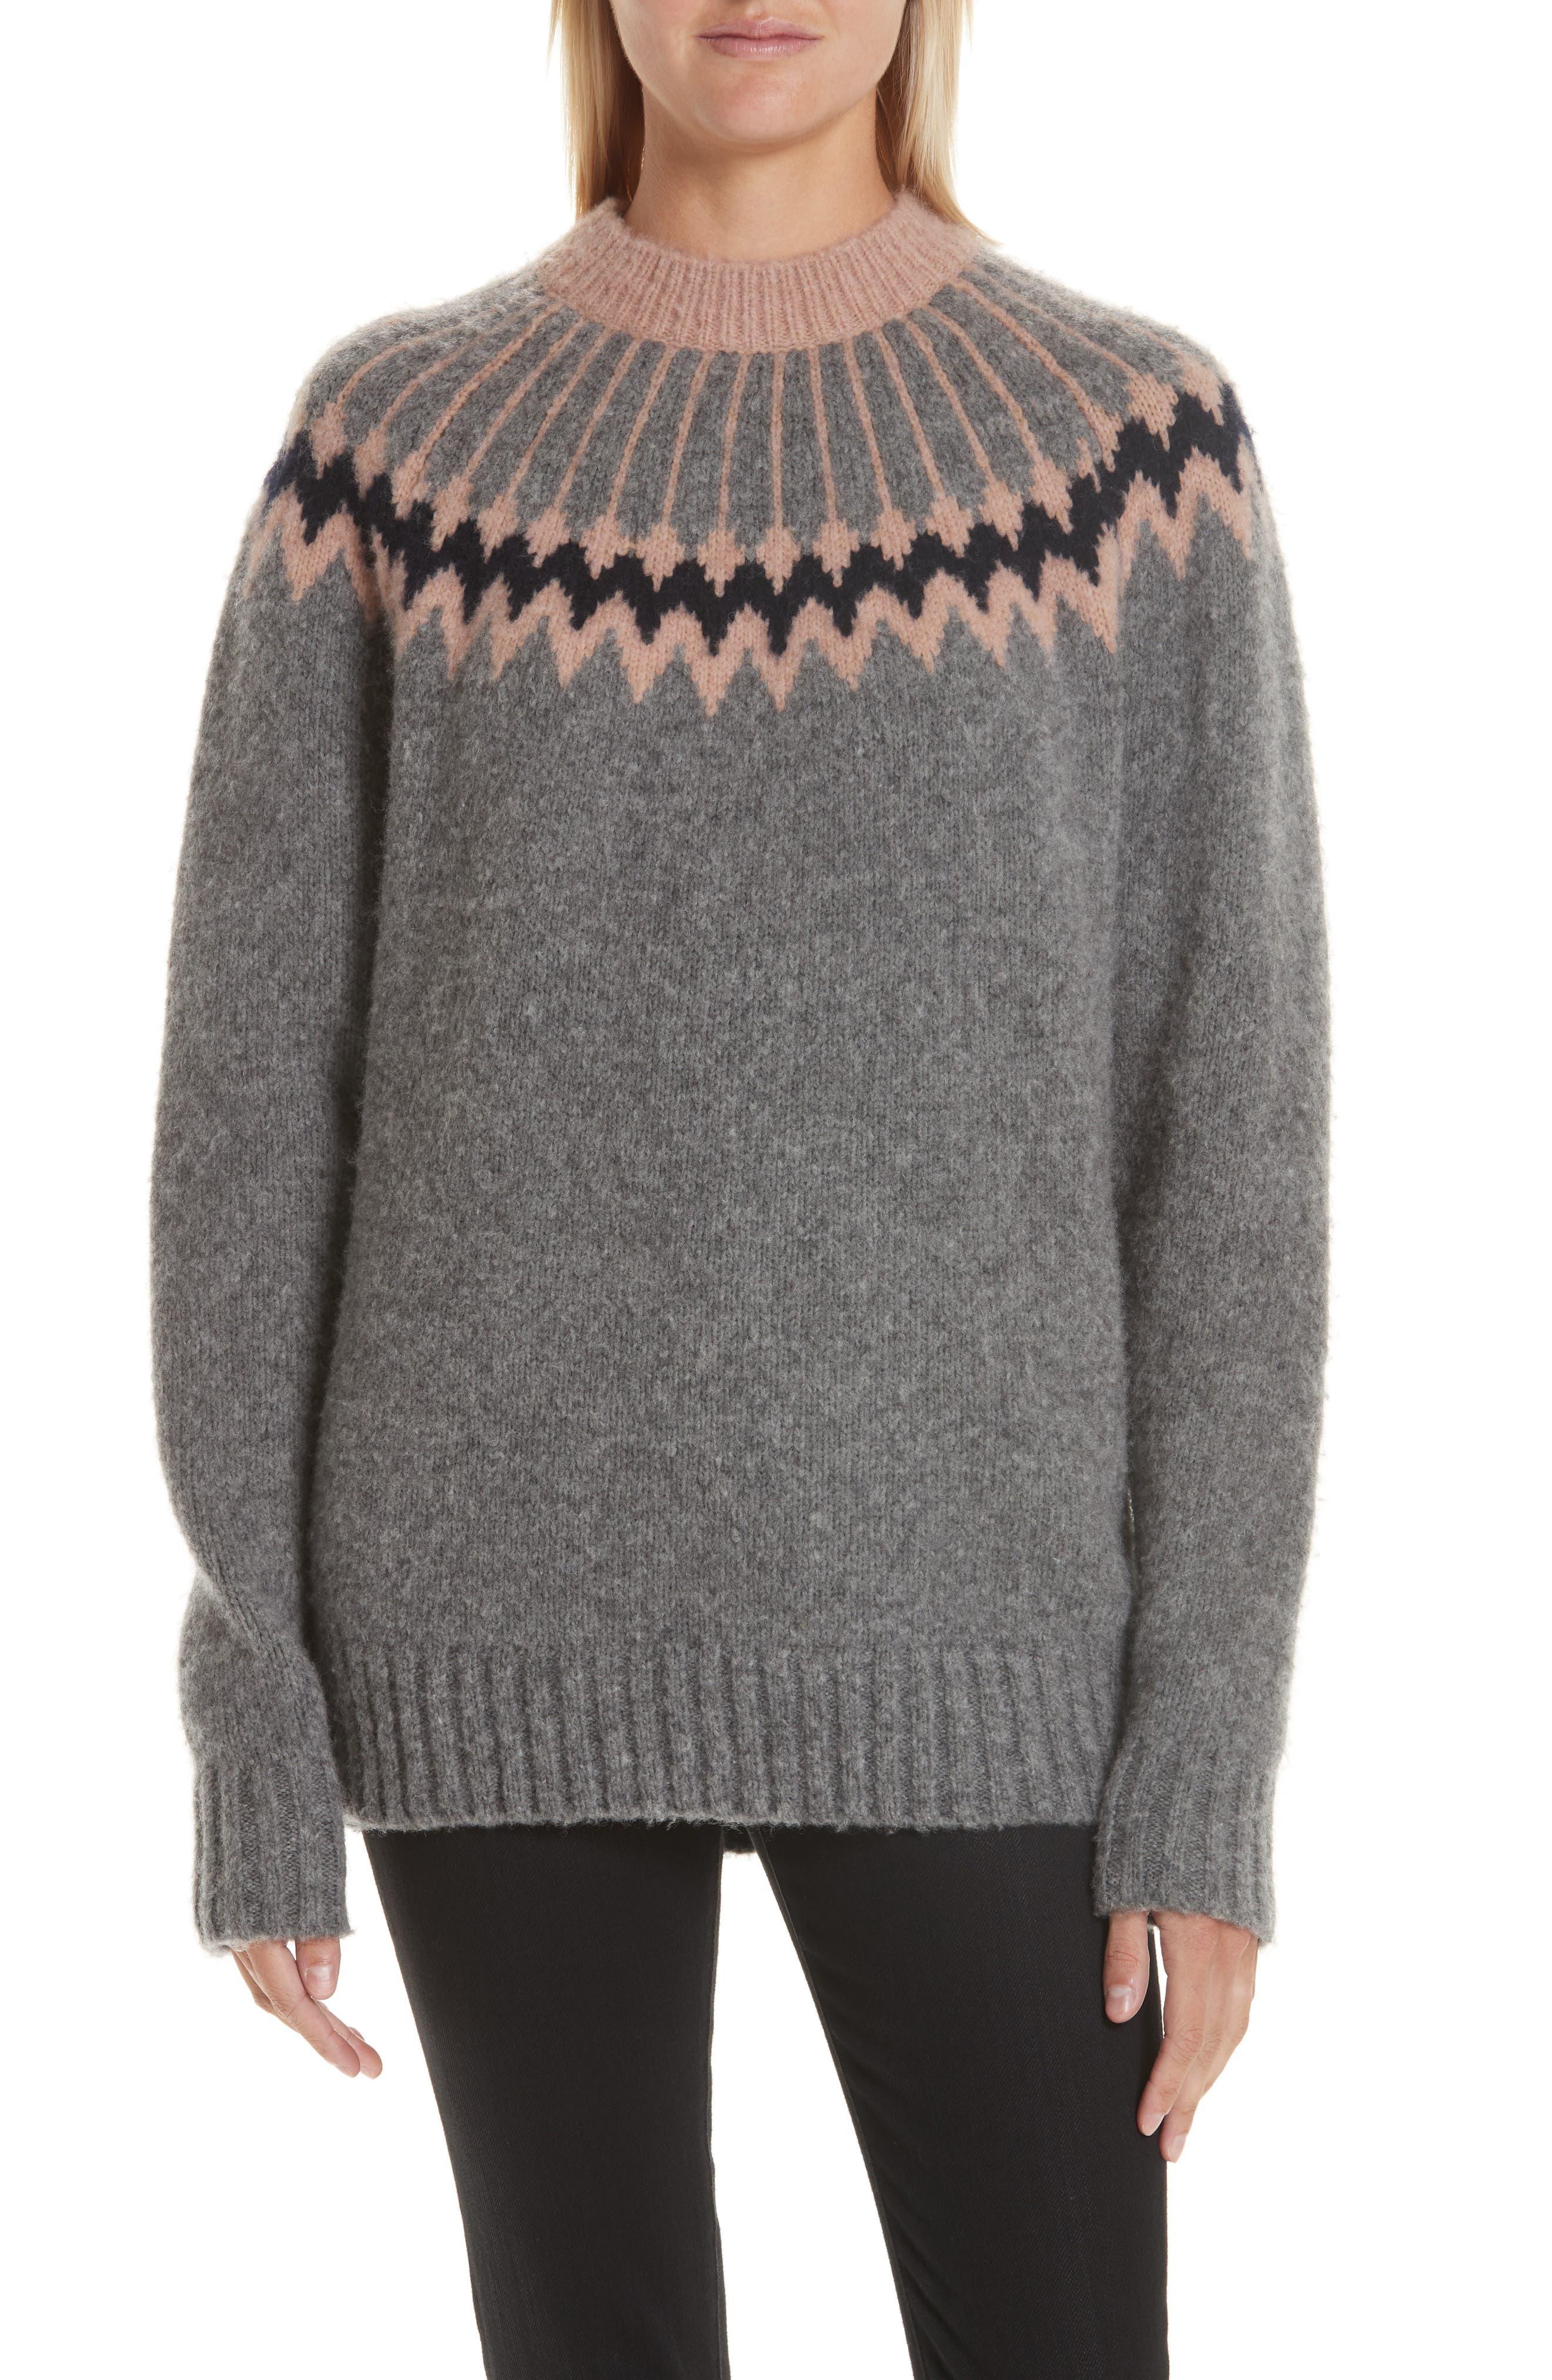 GREY JASON WU Olympia Wool Blend Sweater in Gravel